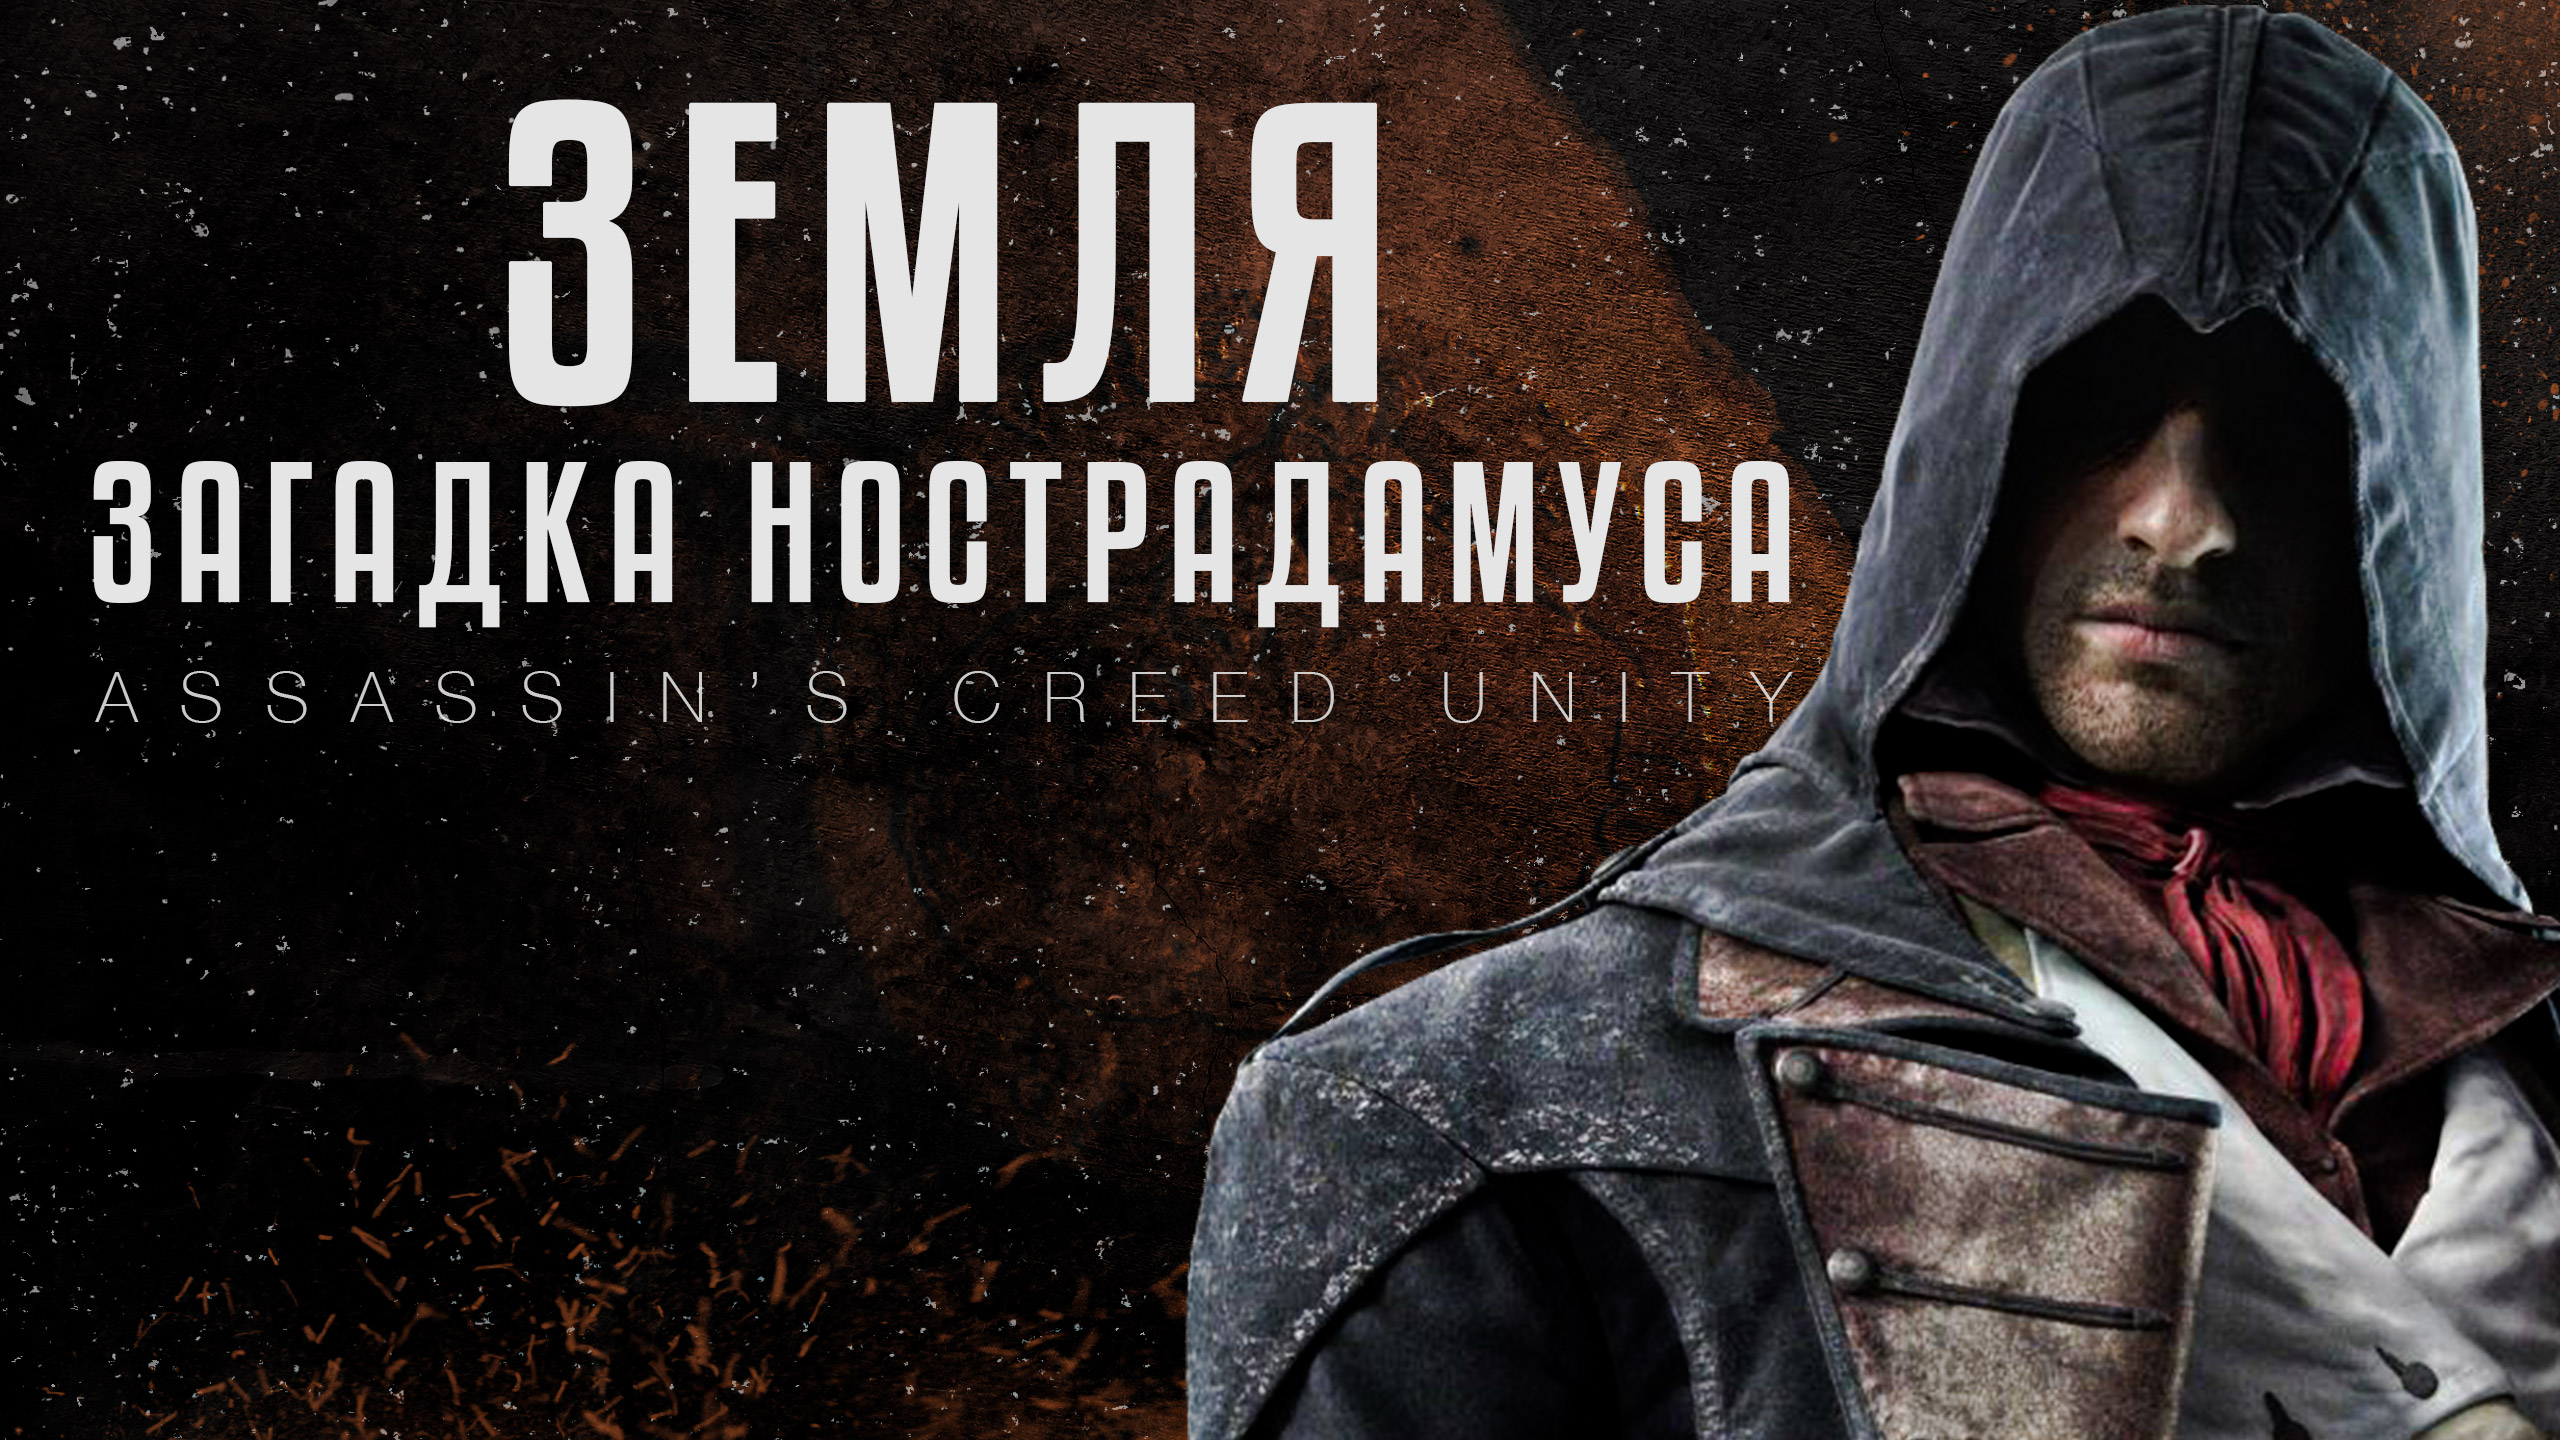 Загадка Нострадамуса в игре Assassin's Creed Unity (Терра)